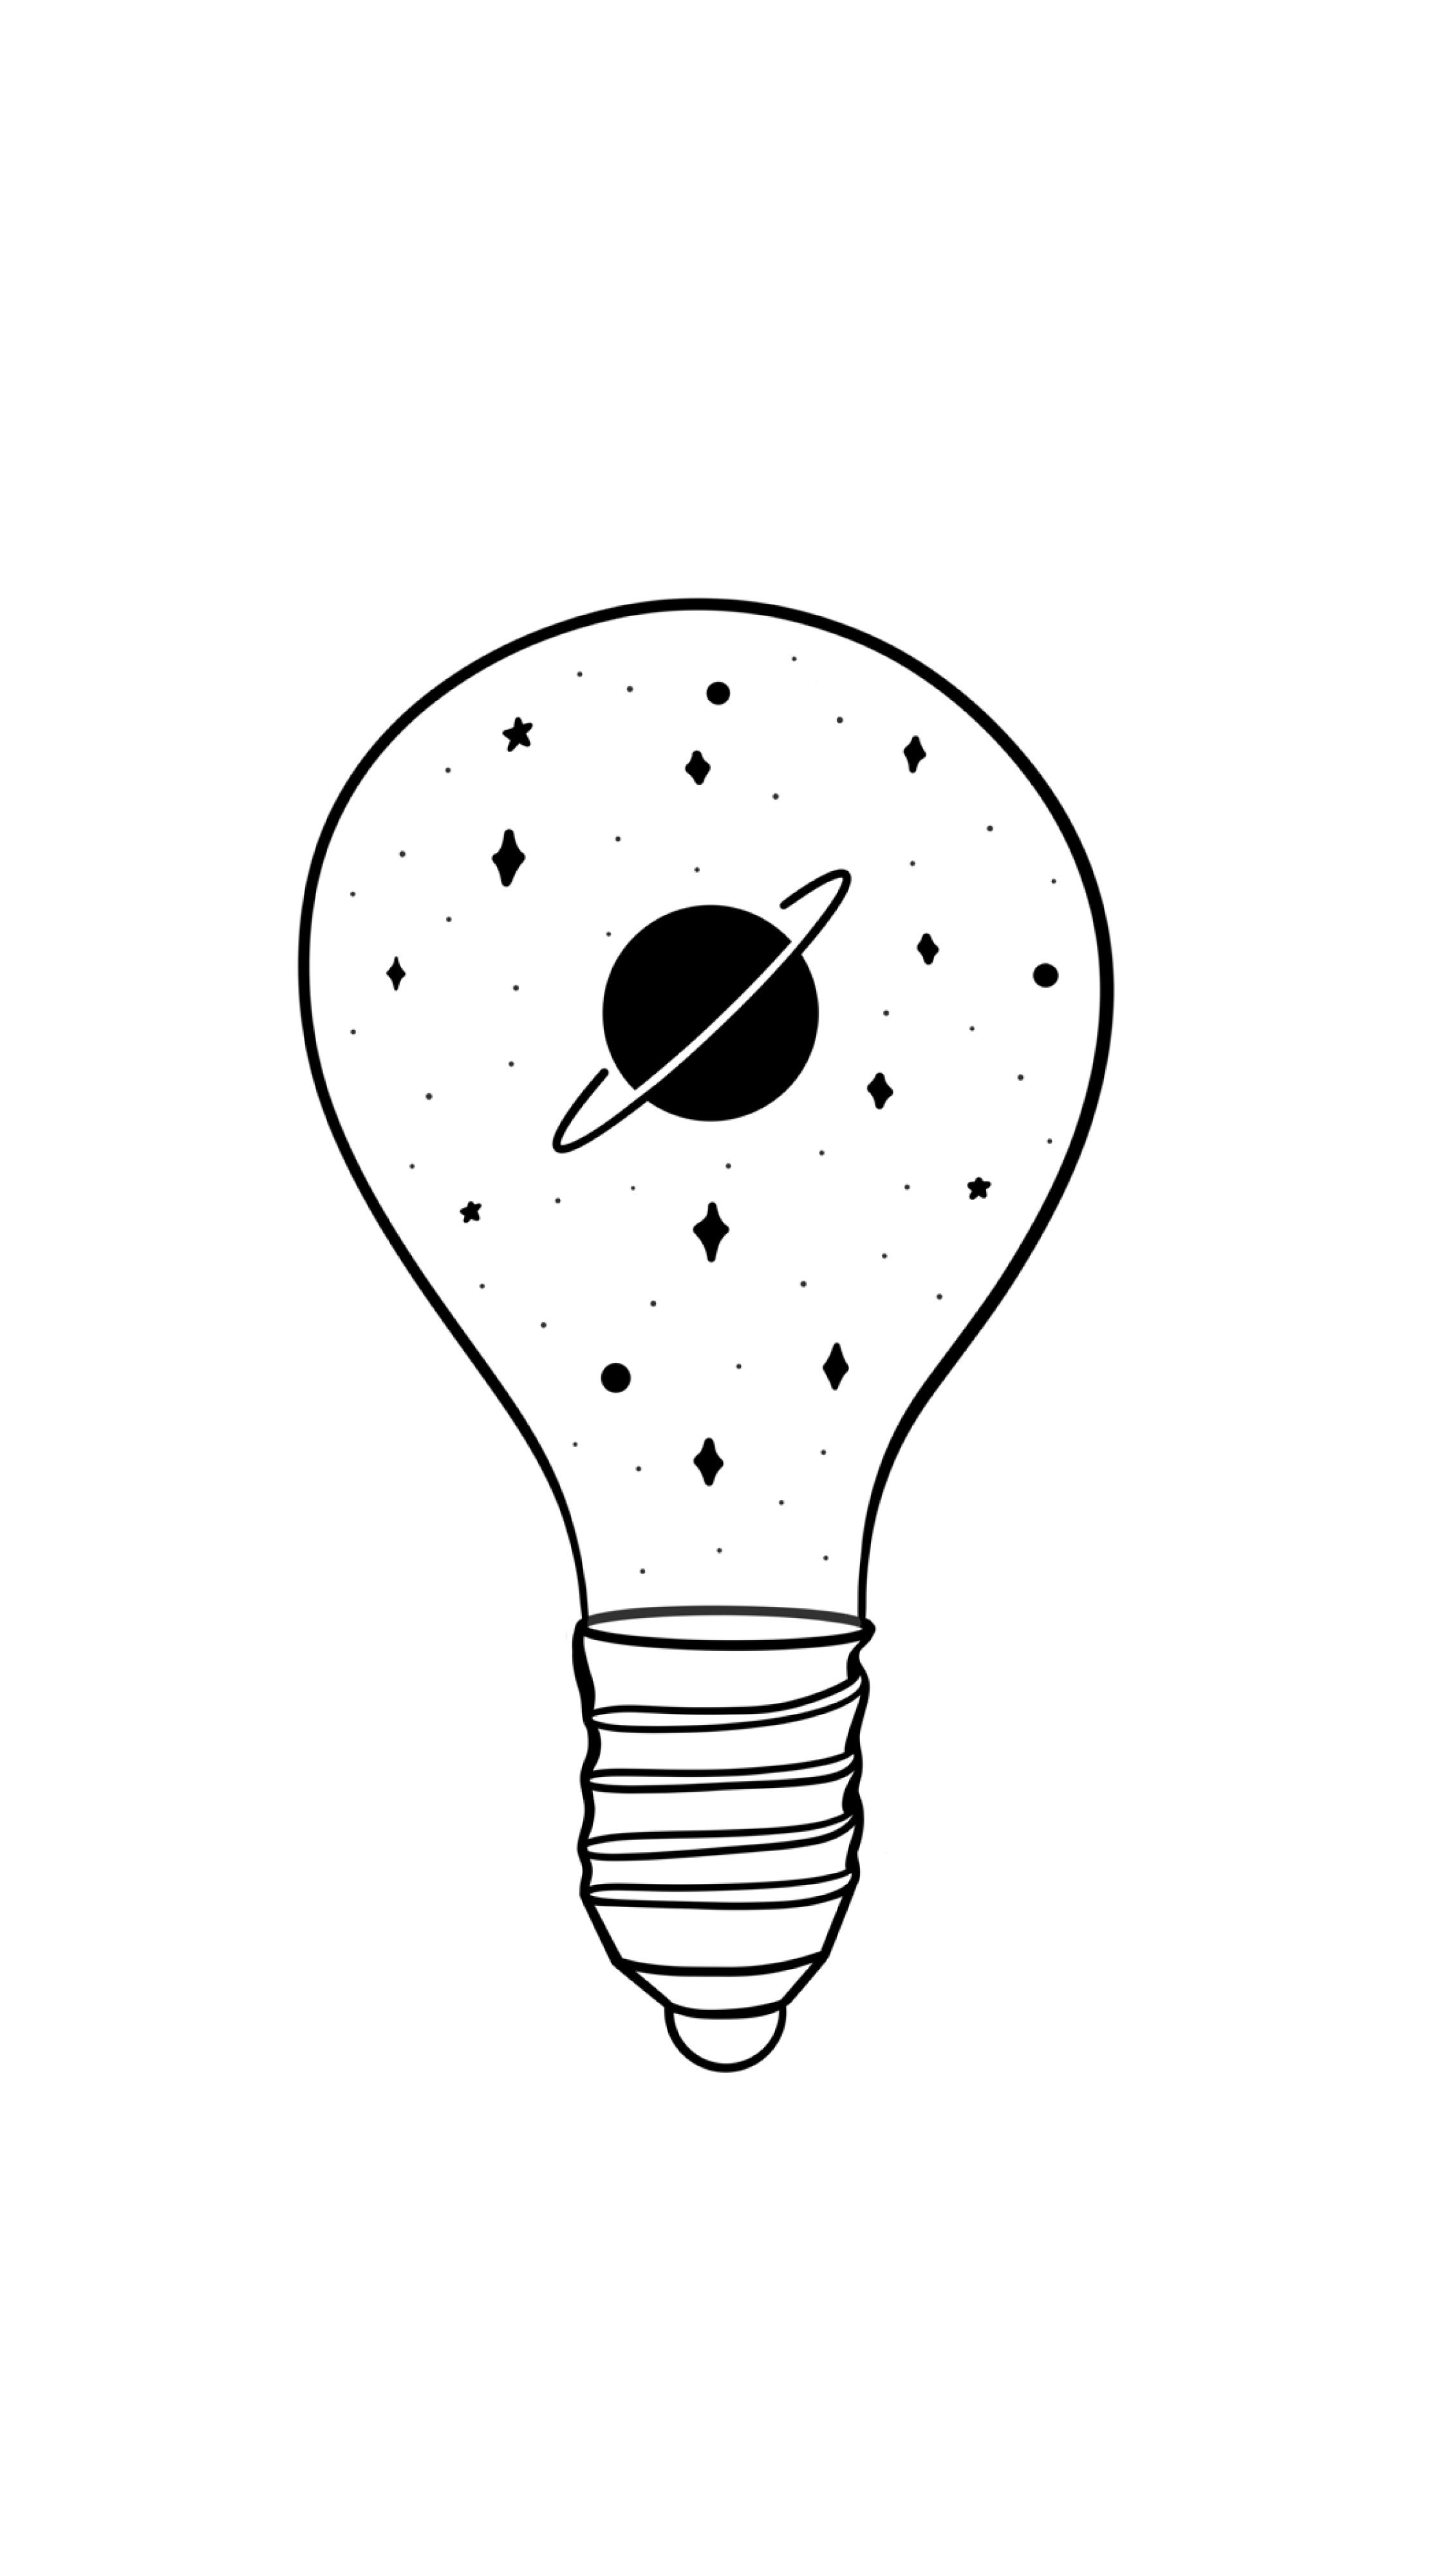 c73e784bebfb6421129106decc002b46 » Cute Lightbulb Drawing